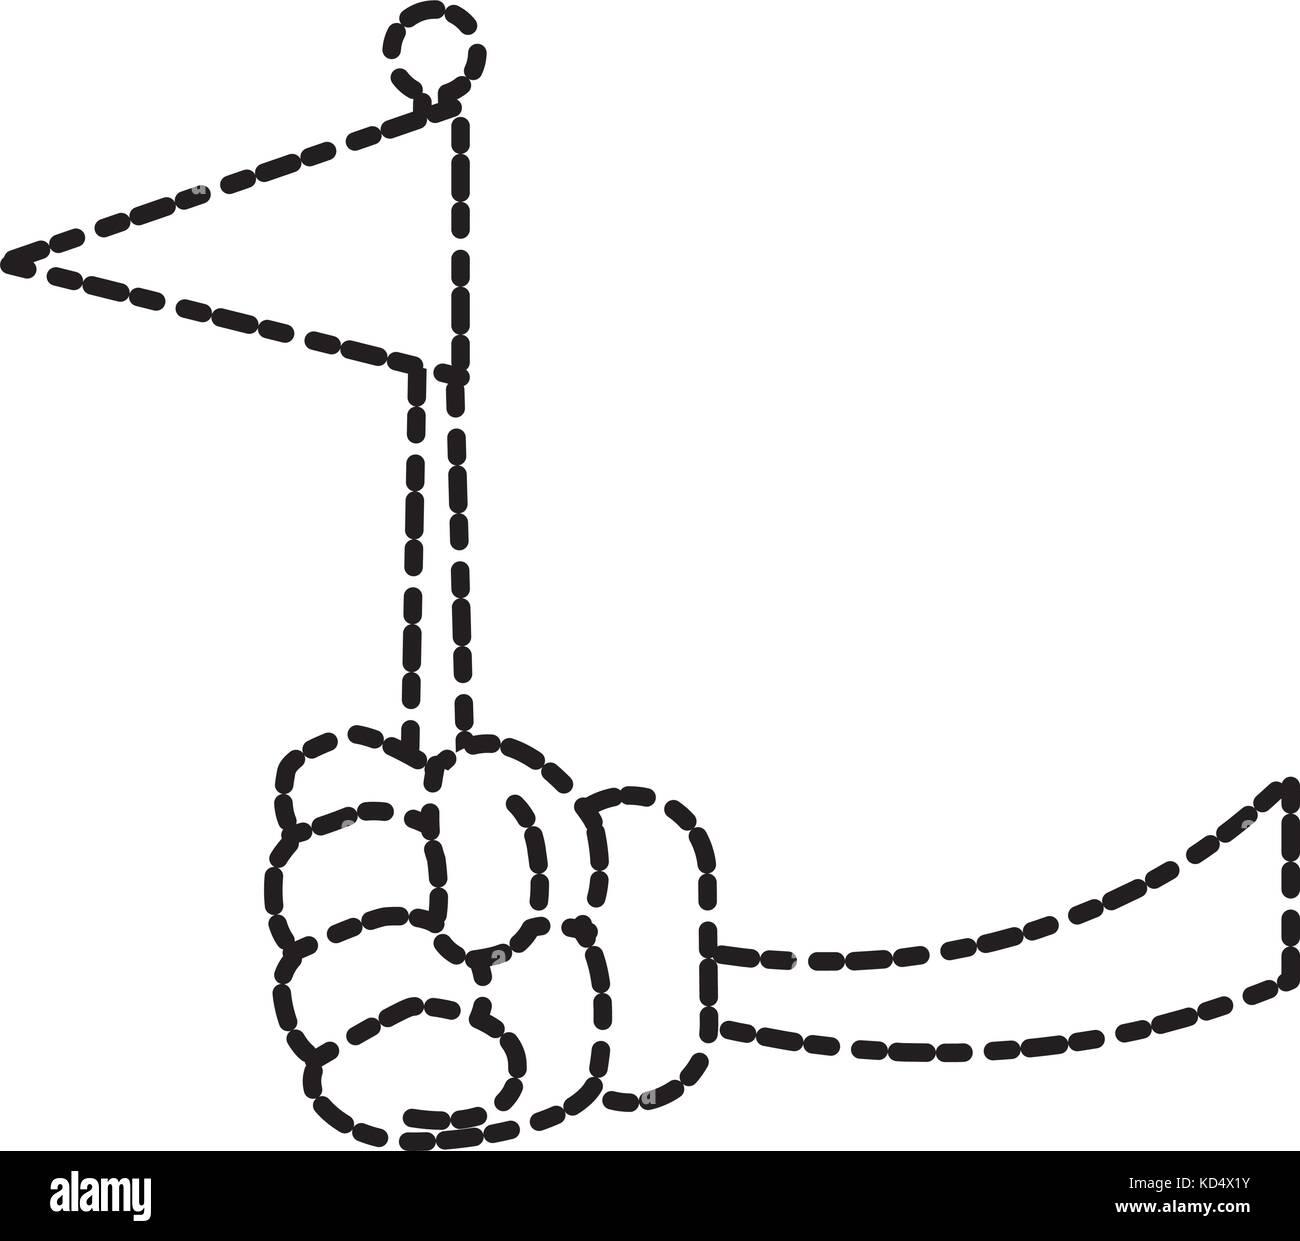 National flag symbol - Stock Image